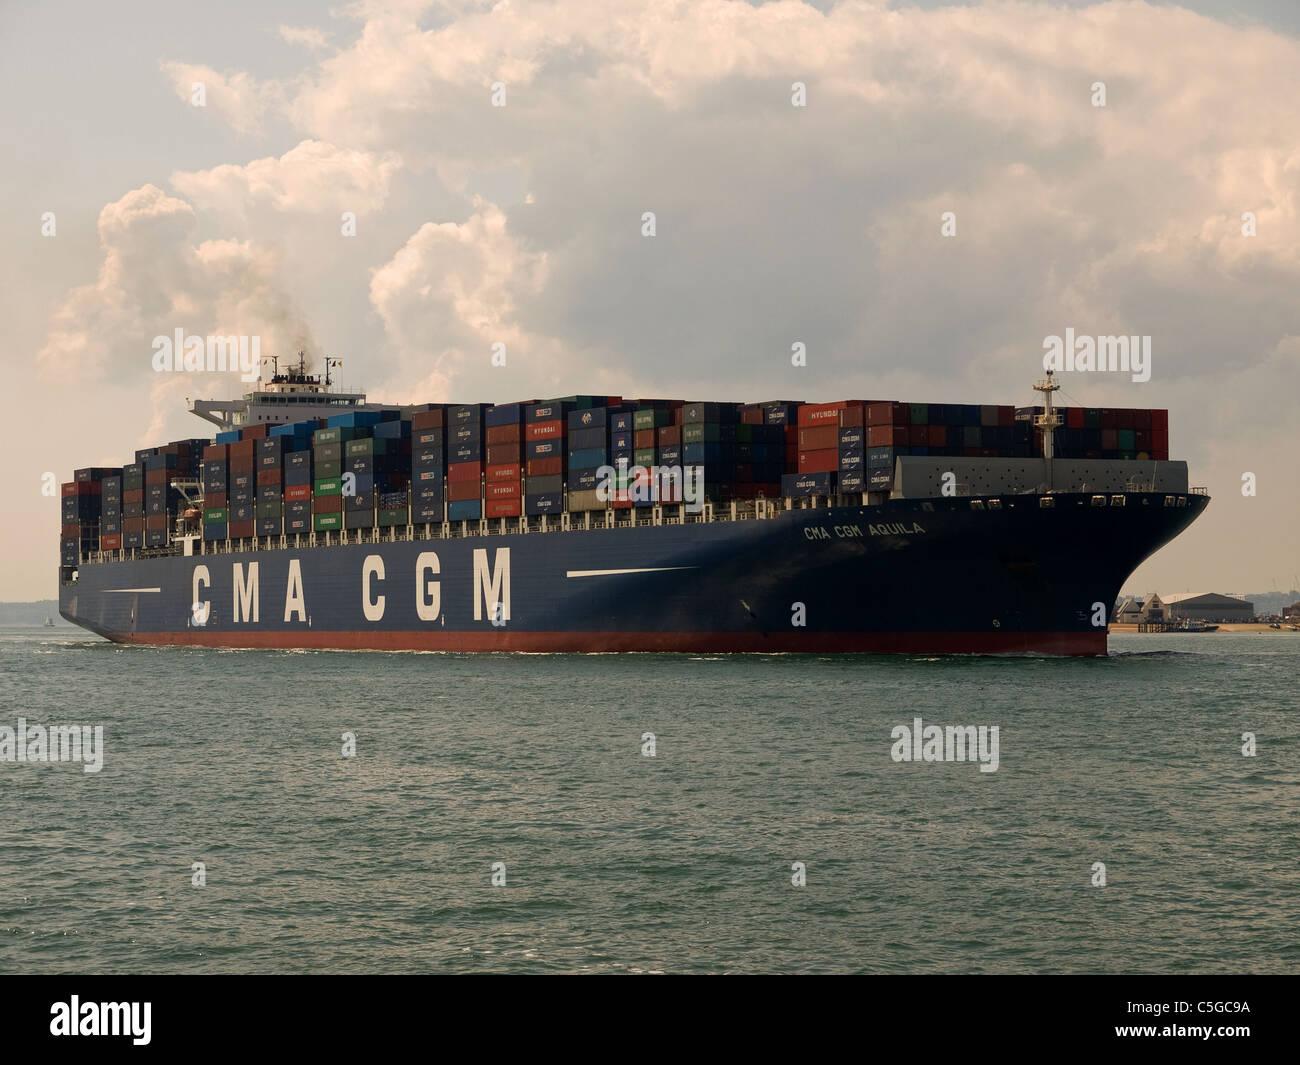 Container ship CMA CGM Aquila arriving at Southampton England UK - Stock Image